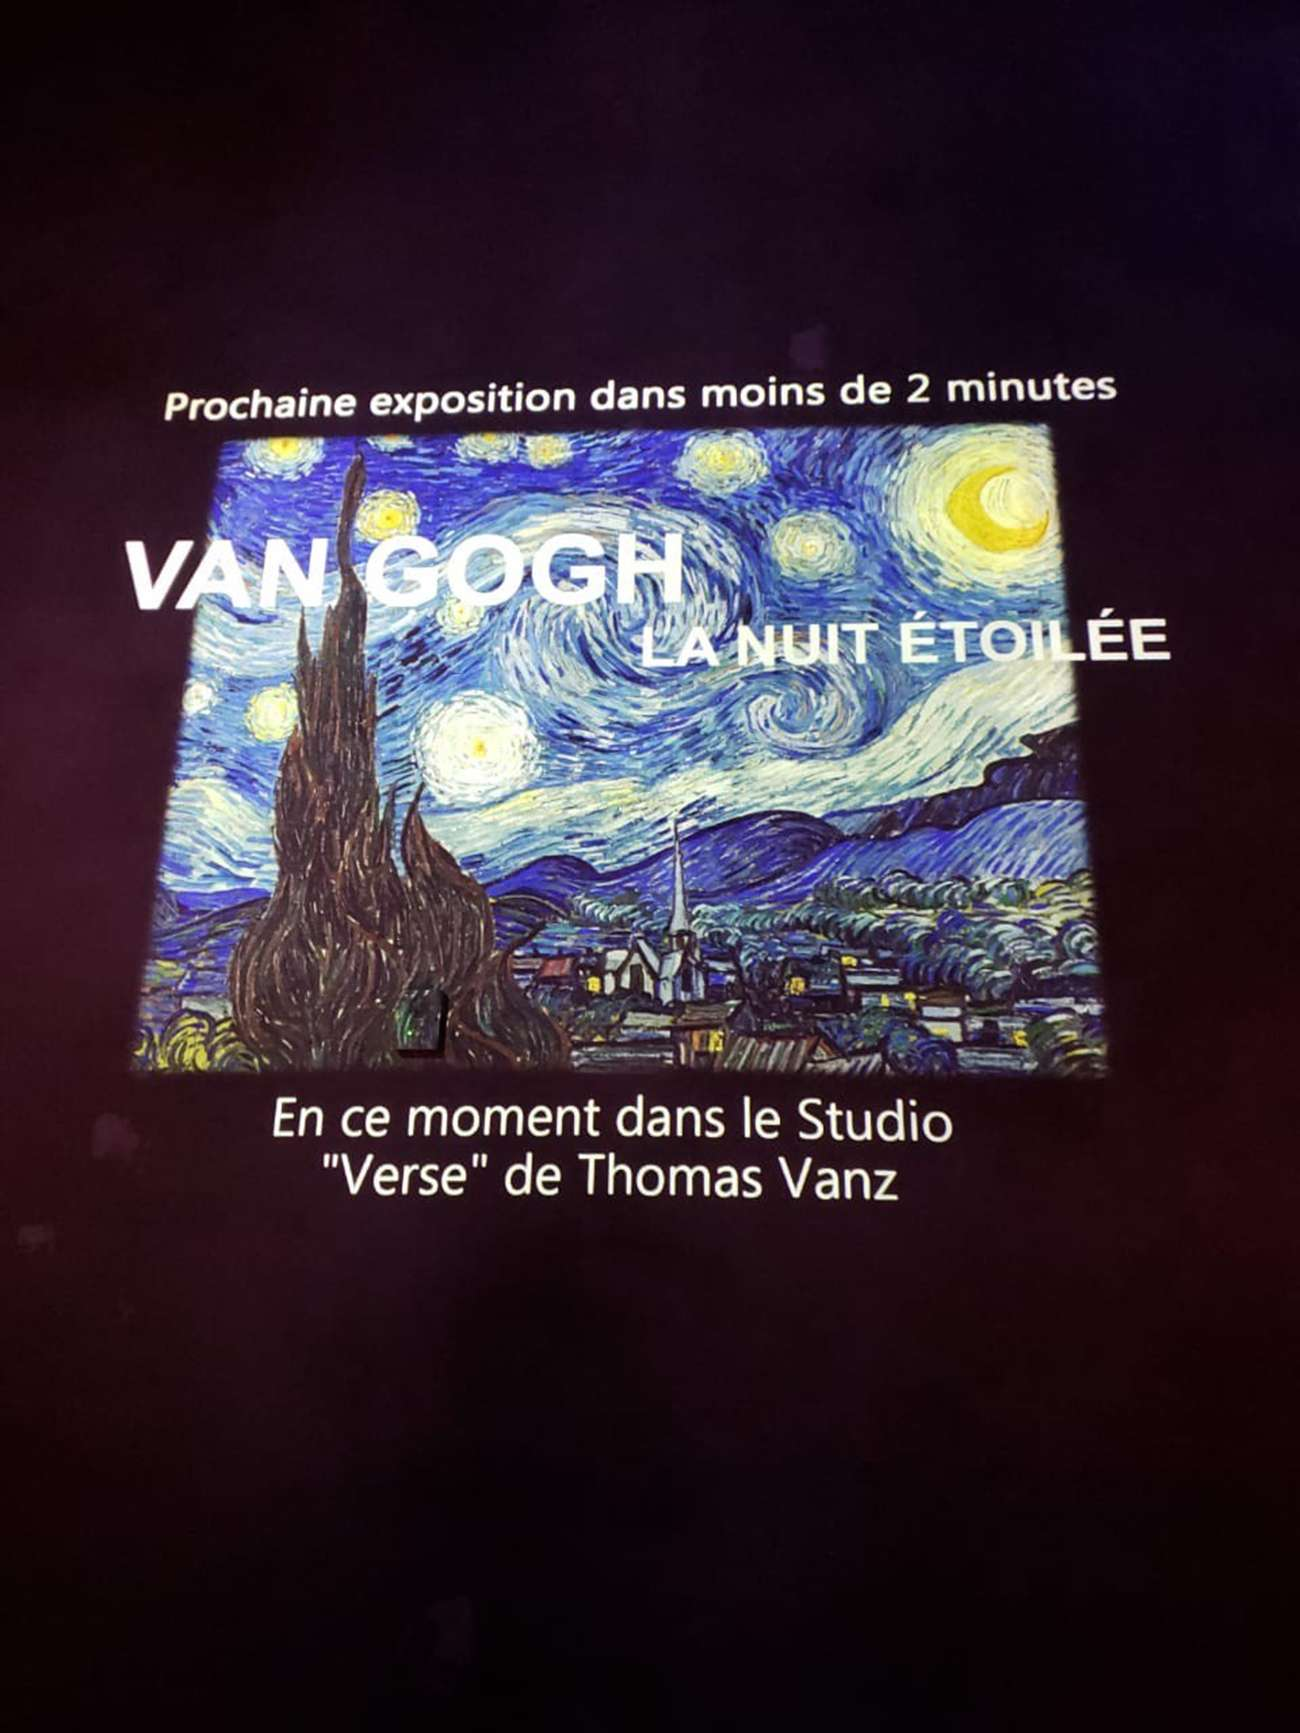 Artista plástica brasileira visita exposições de arte de Paris